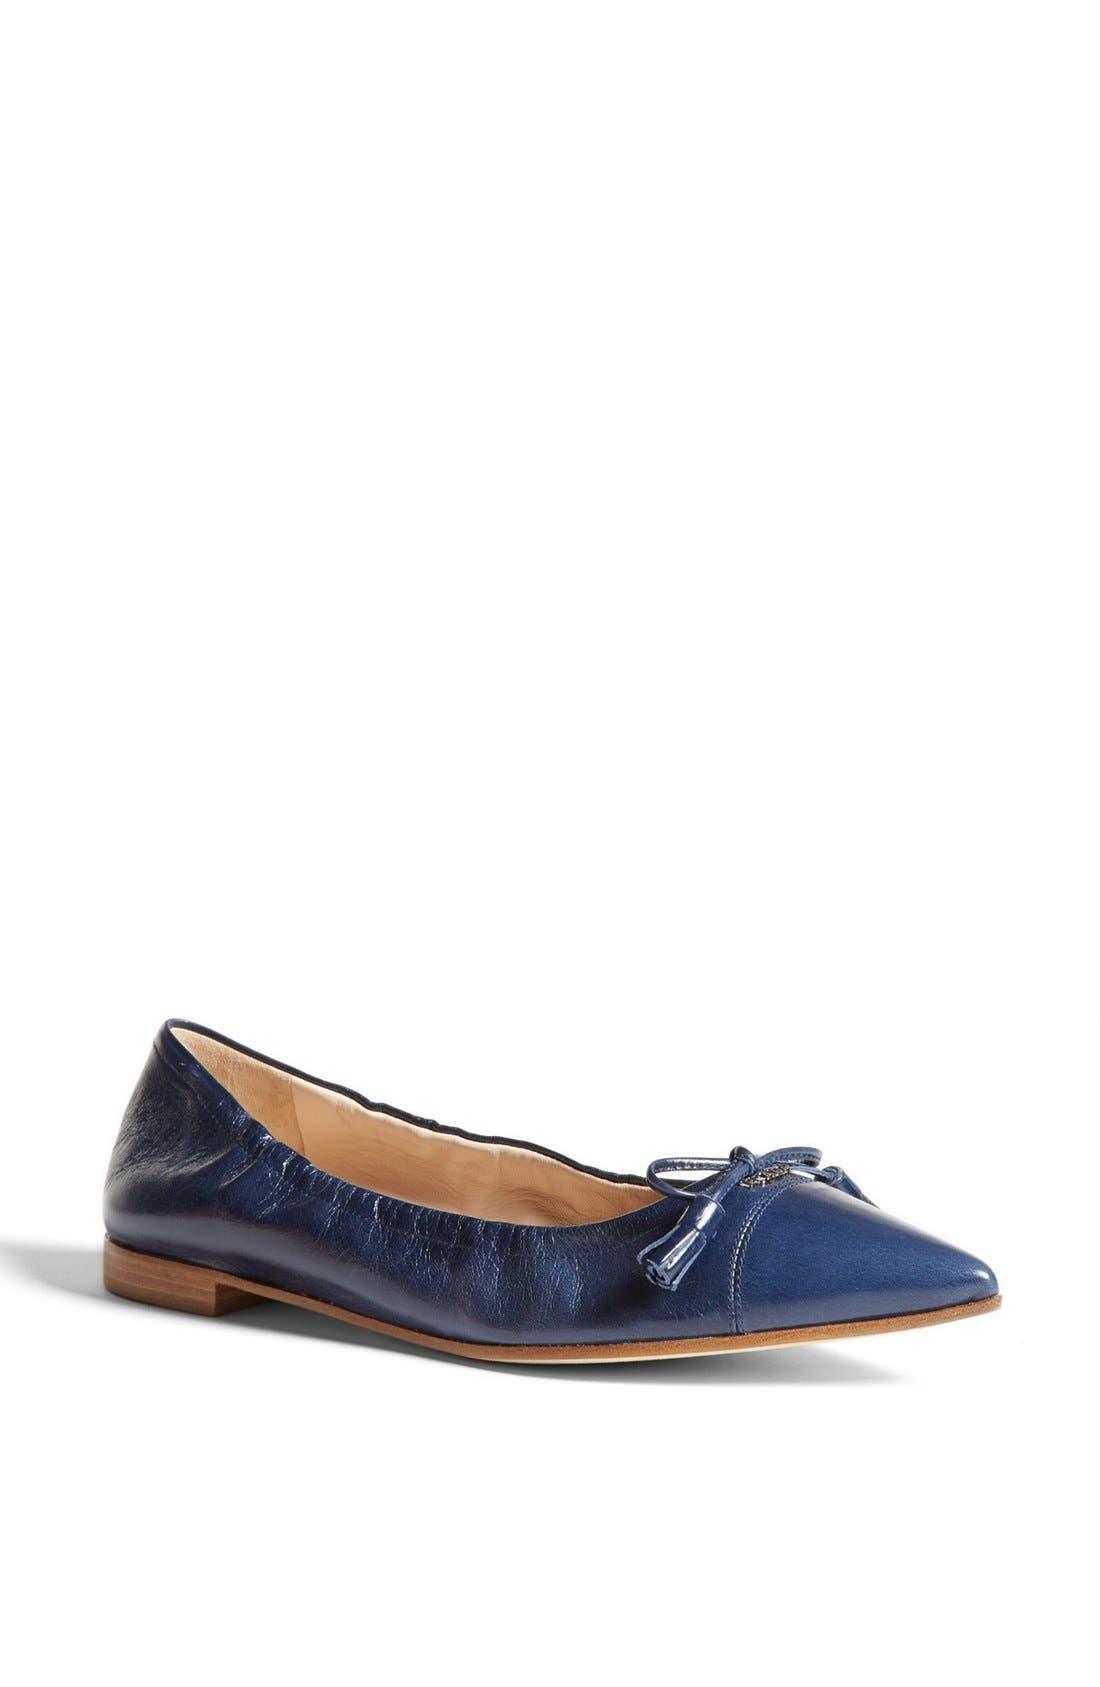 Alternate Image 1 Selected - Prada Pointy Toe Ballerina Flat